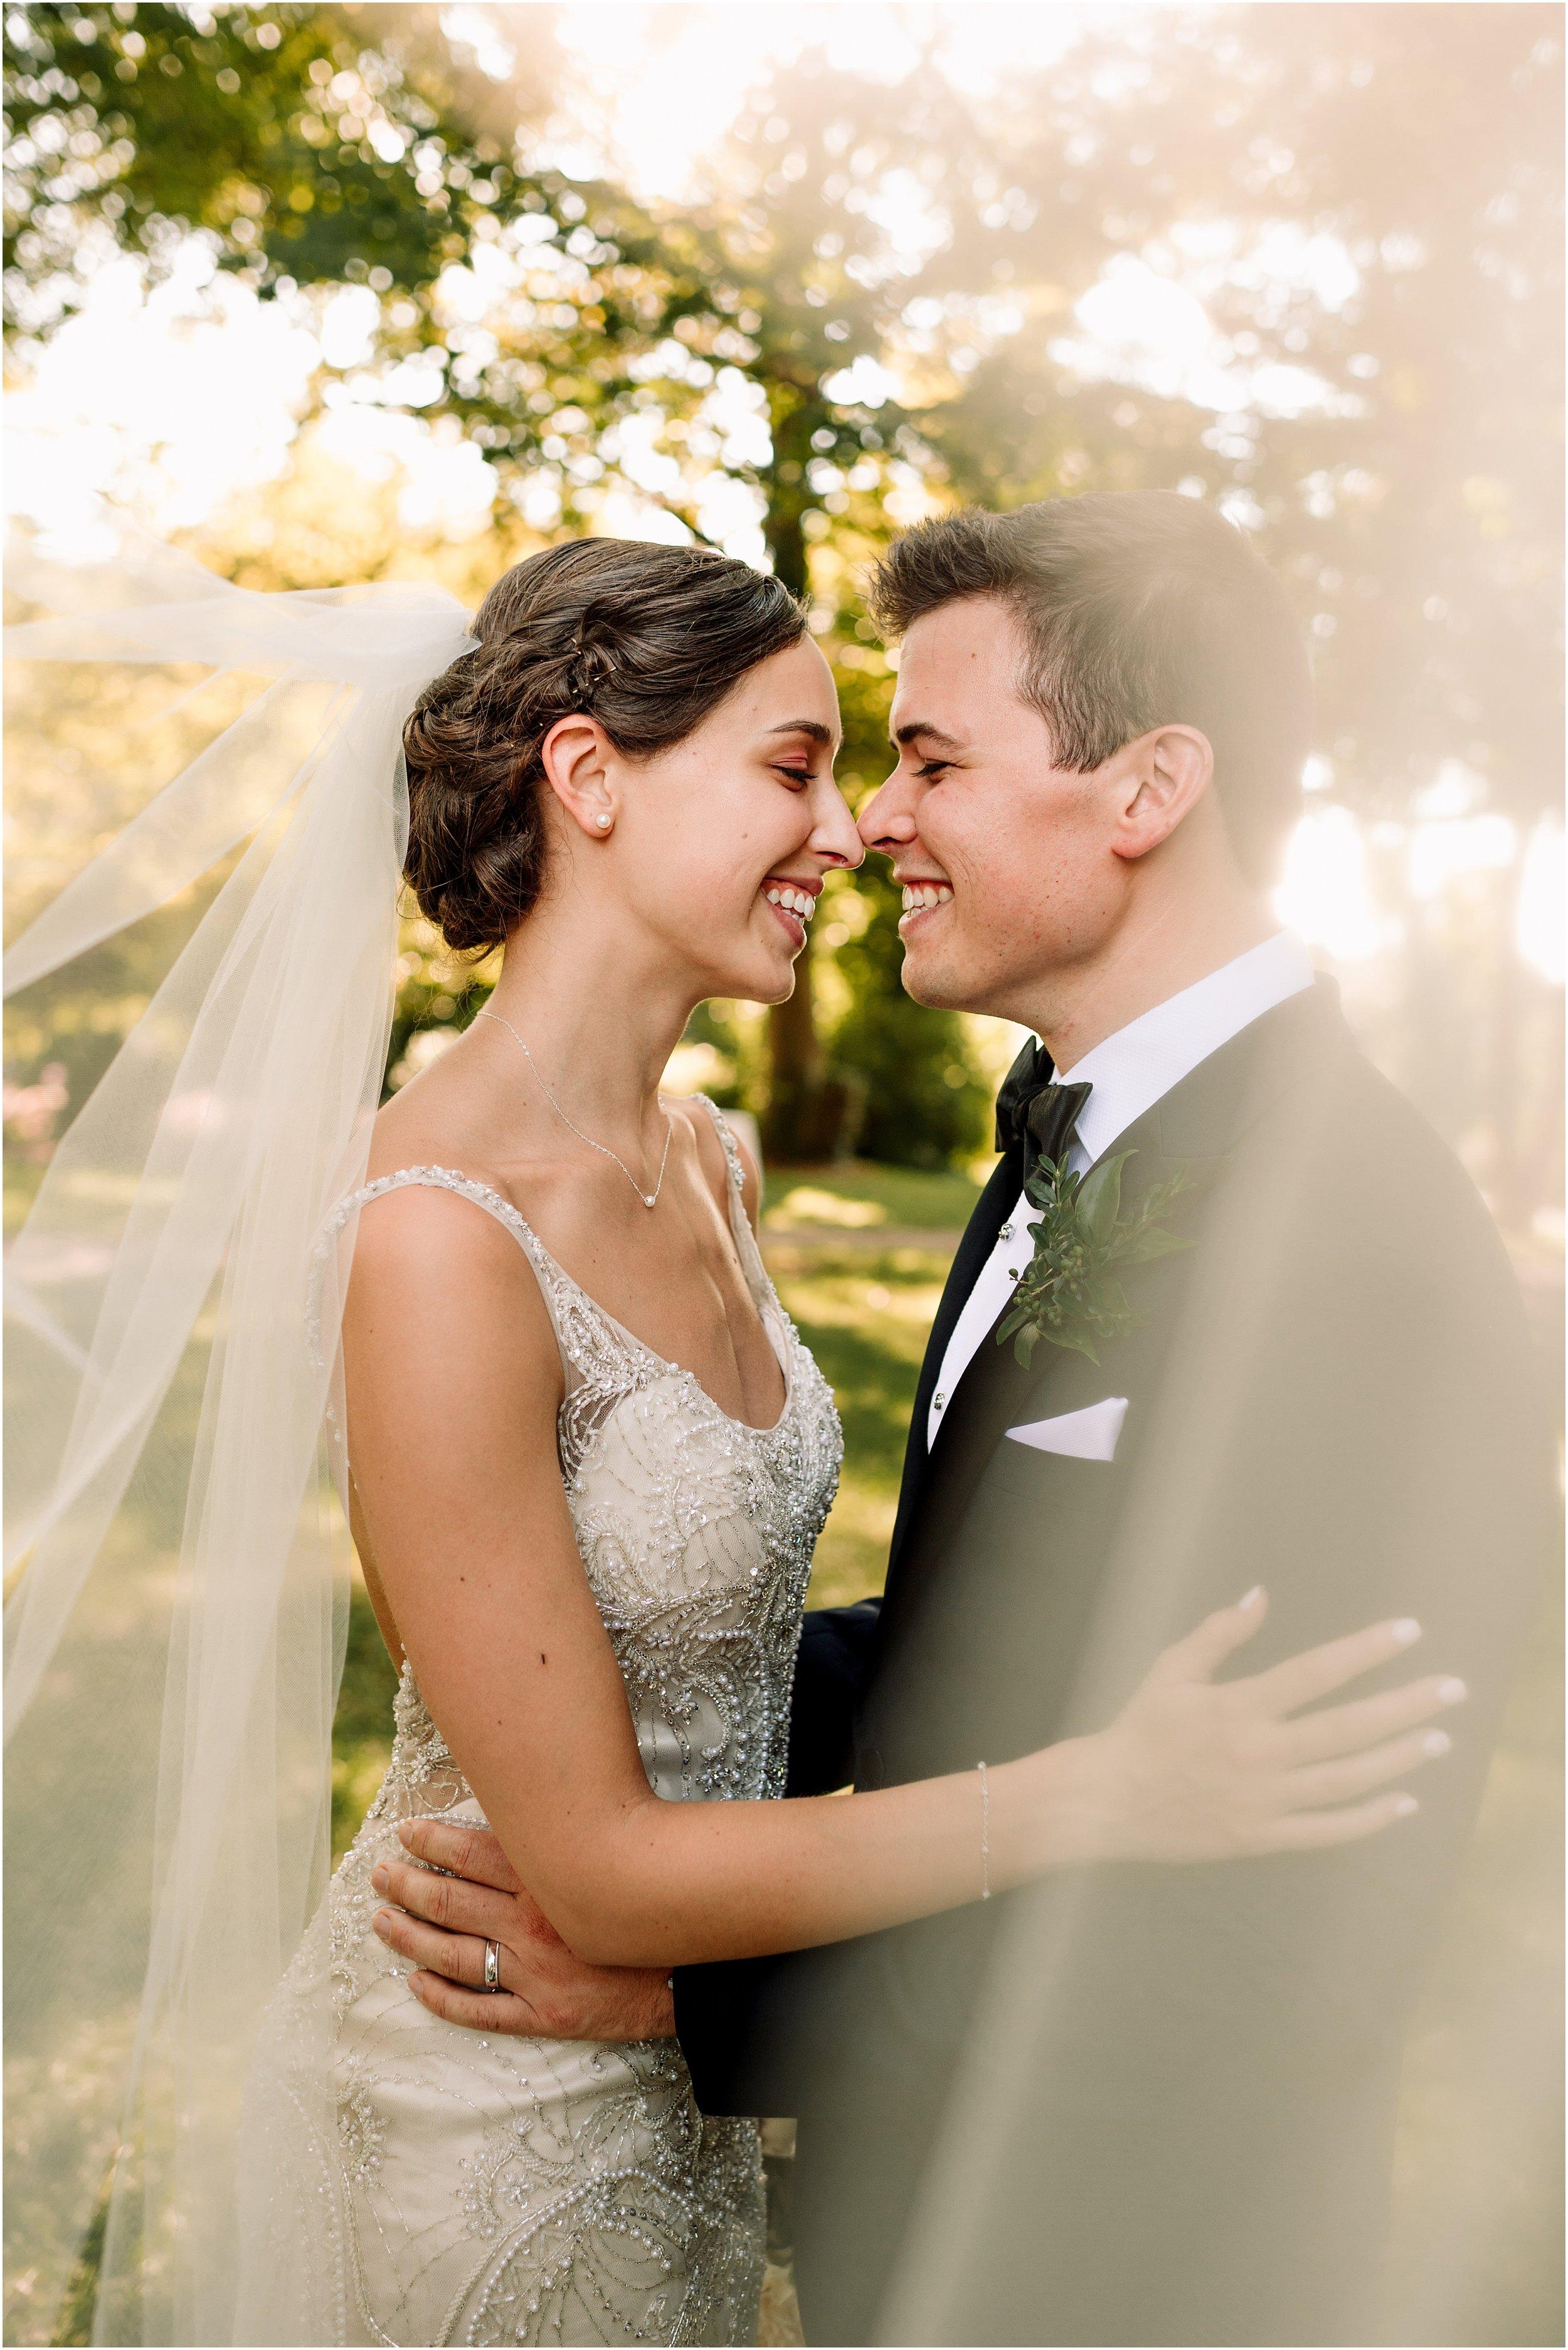 hannah leigh photography Antrim 1844 Wedding_1230.jpg